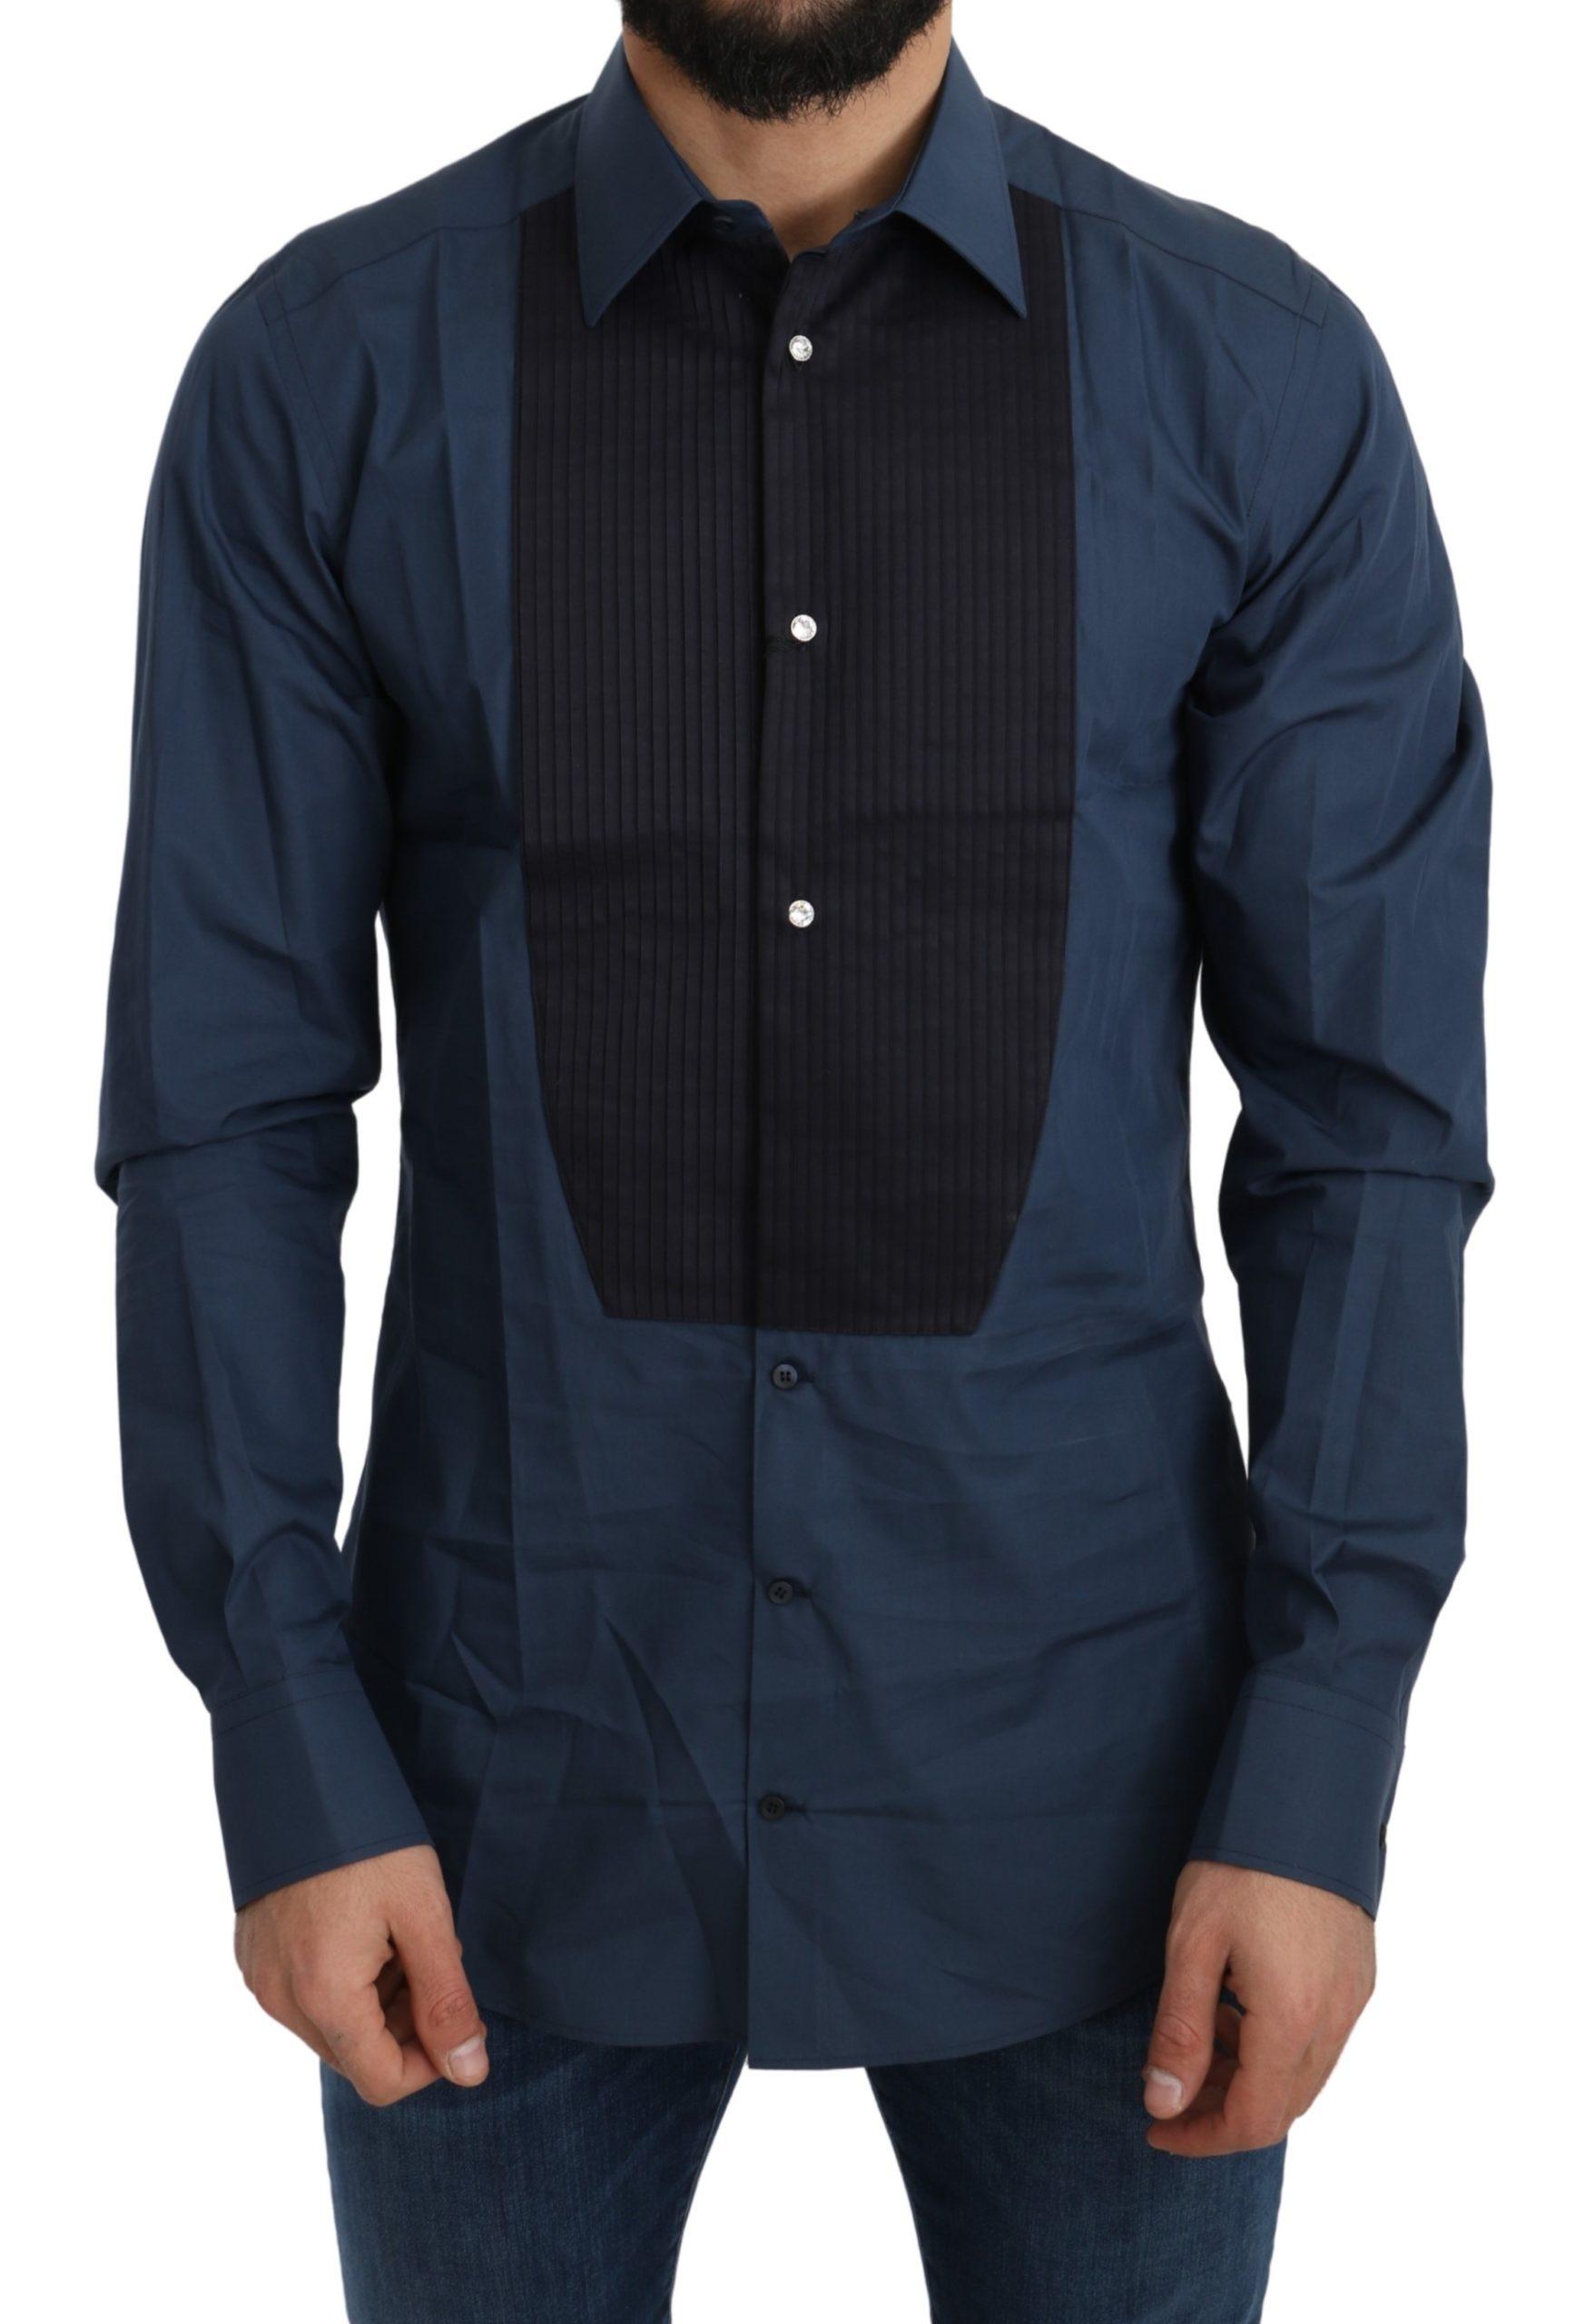 Dolce & Gabbana Men's Cotton GOLD Shirt Blue TSH5216 - 44 | 3XL